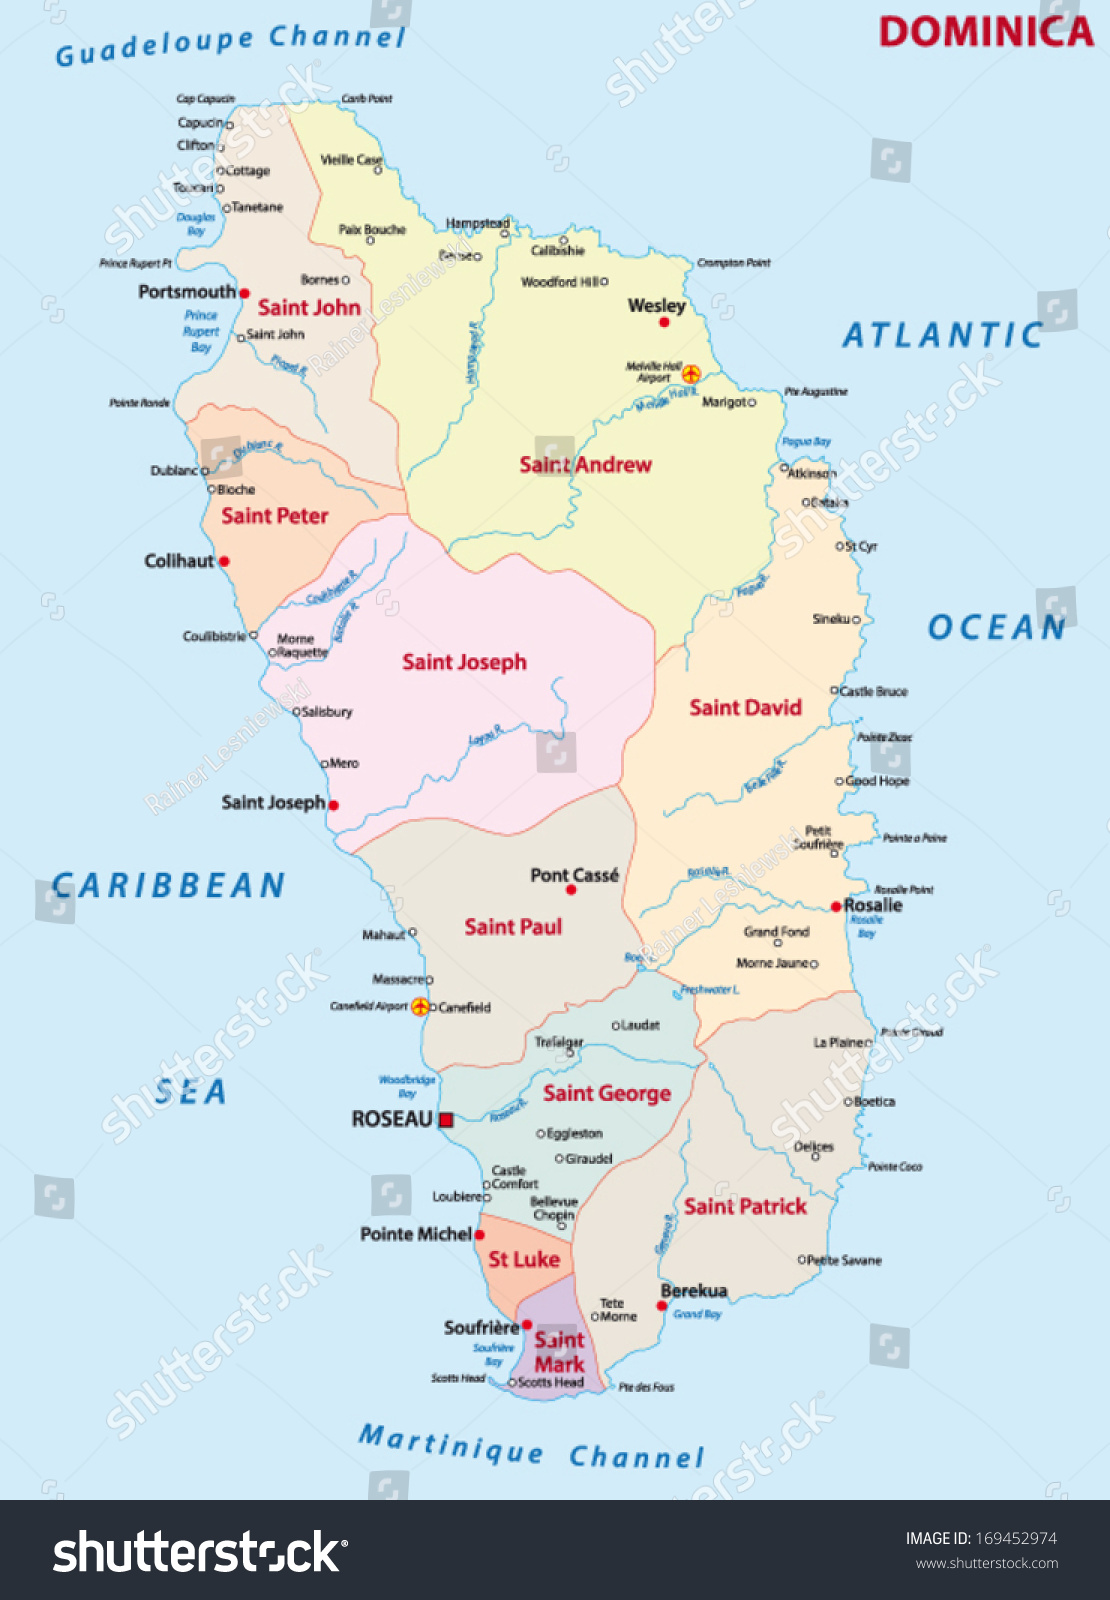 Dominica Administrative Map Stock Vector 169452974 Shutterstock